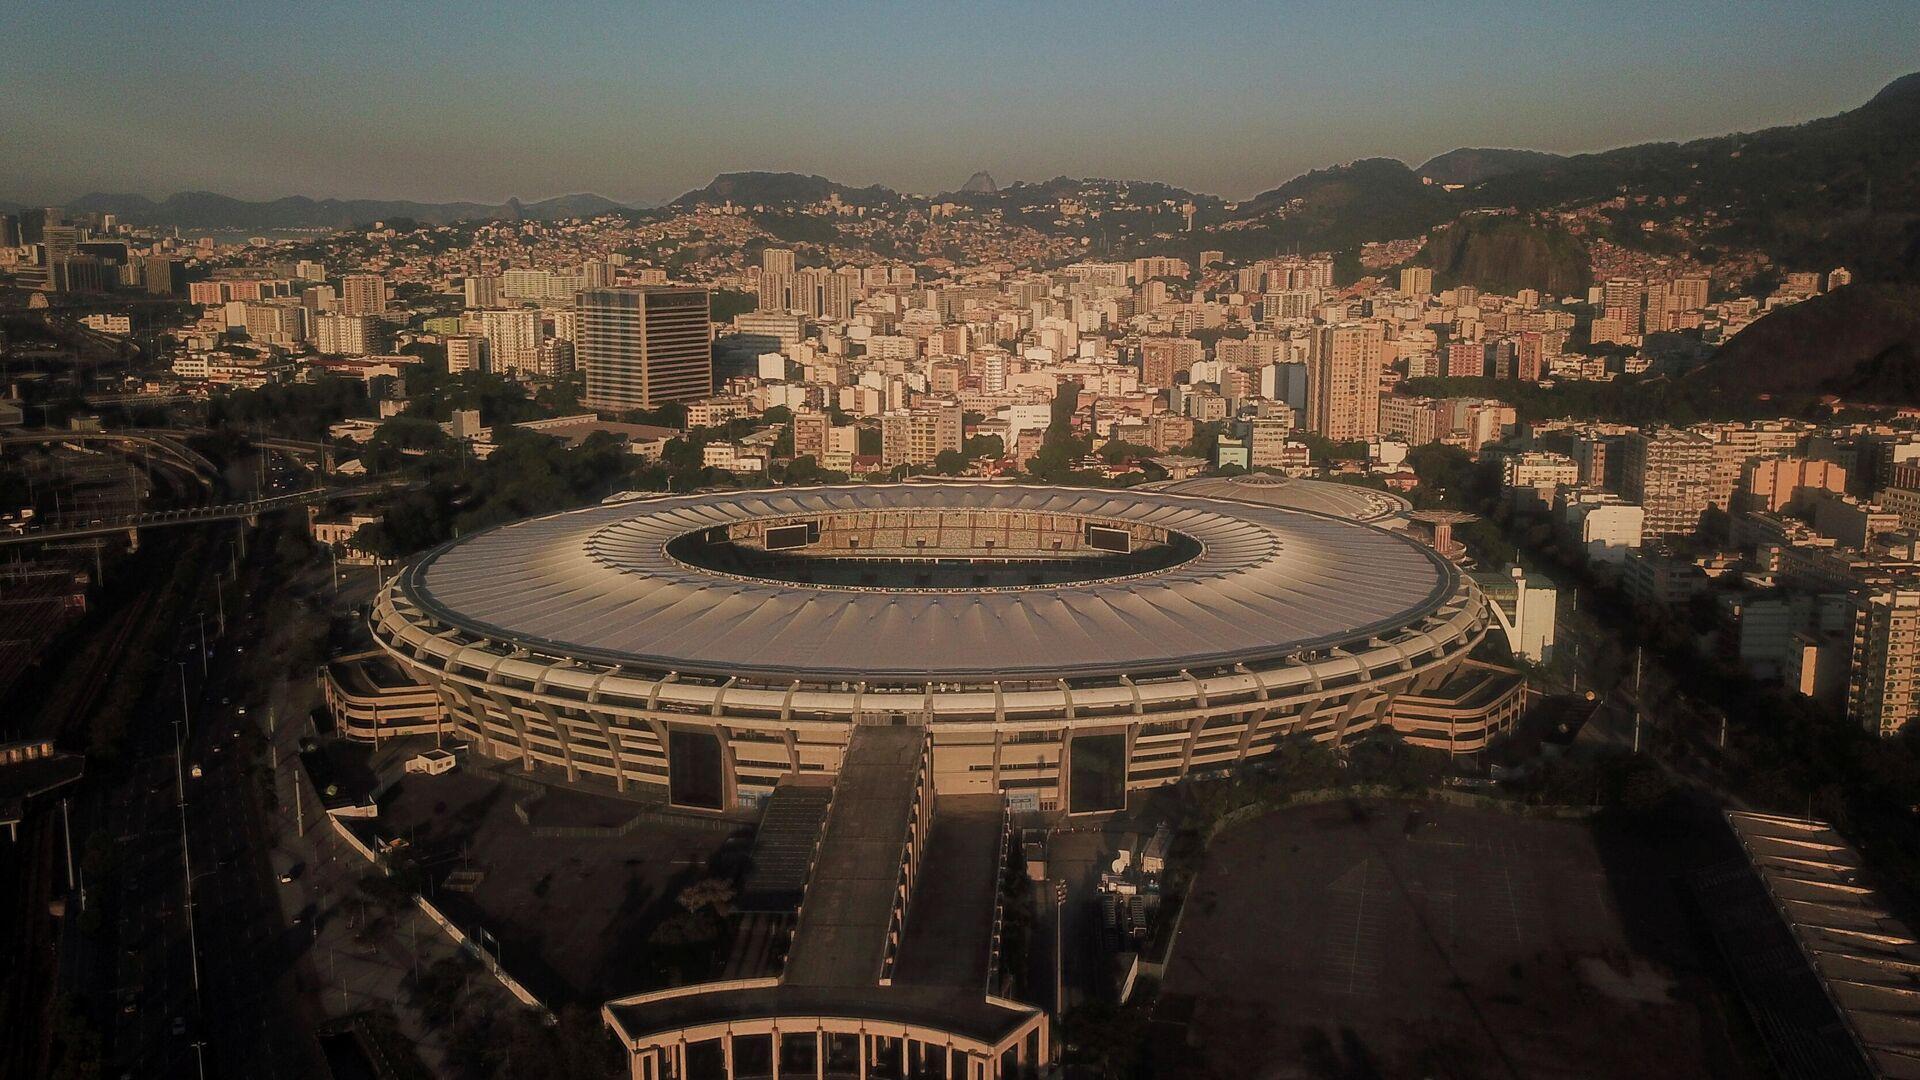 El estadio Maracana en Río de Janeiro en Brasil - Sputnik Mundo, 1920, 07.06.2021